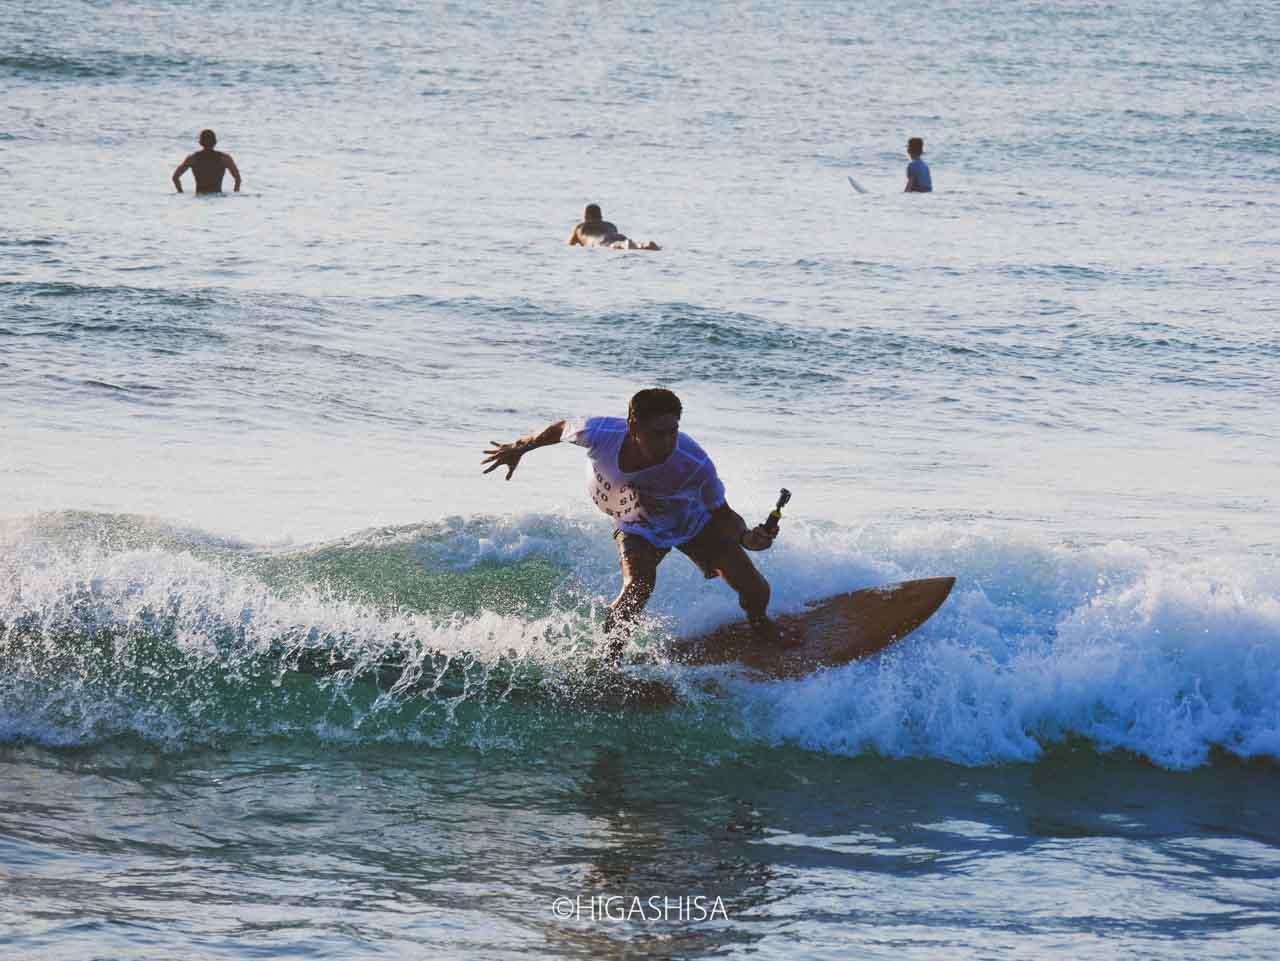 taiwan-surfing